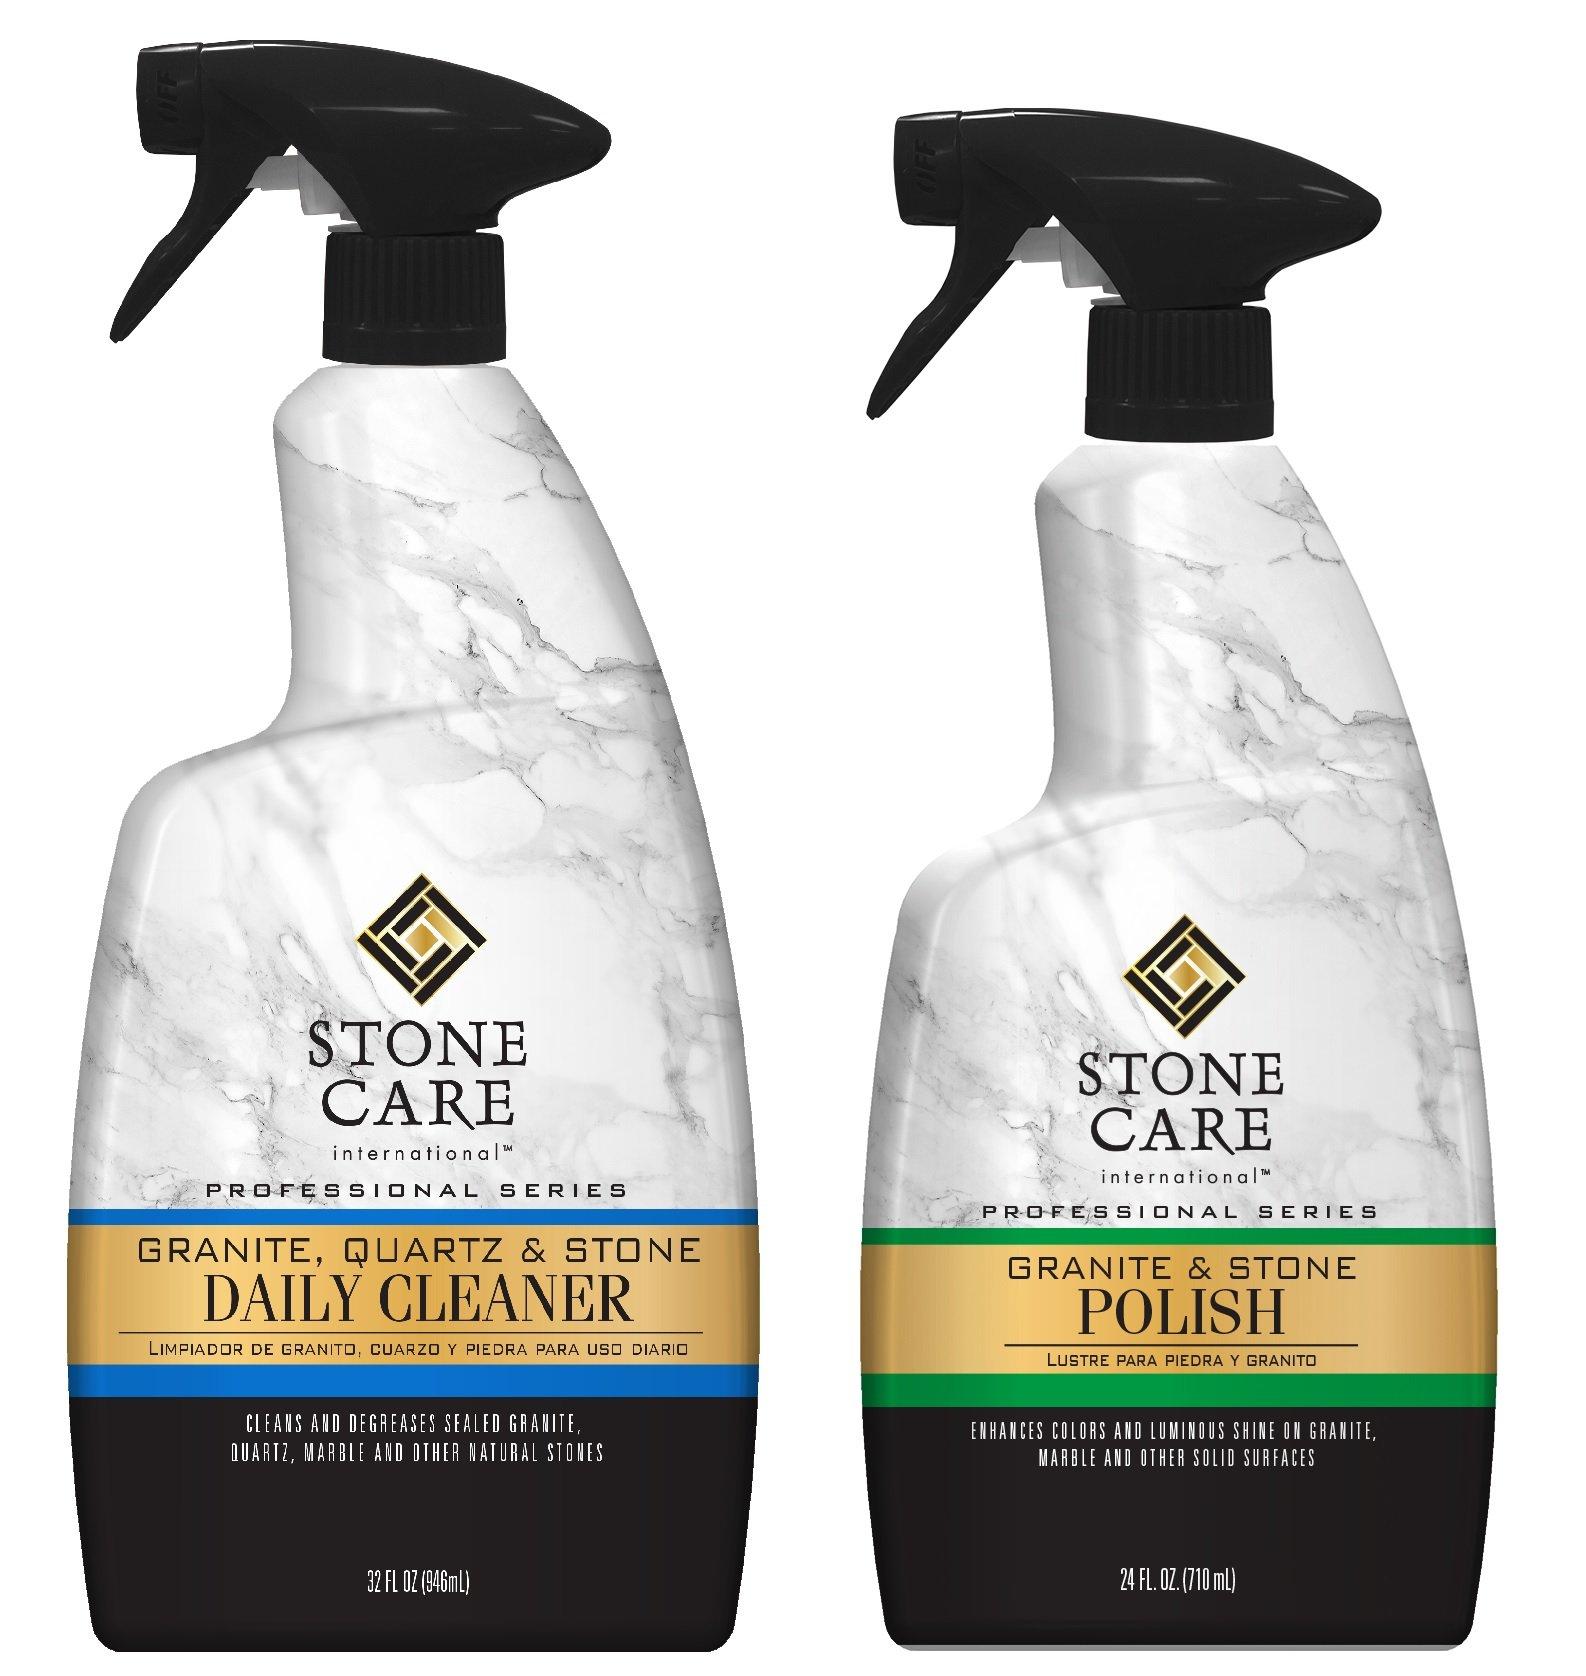 Stone Care International Granite Stone Cleaner and Polish Combo - 2 Pack - For Granite Marble Soapstone Quartz Quartzite Slate Limestone Corian Laminate Tile Countertop and Mor